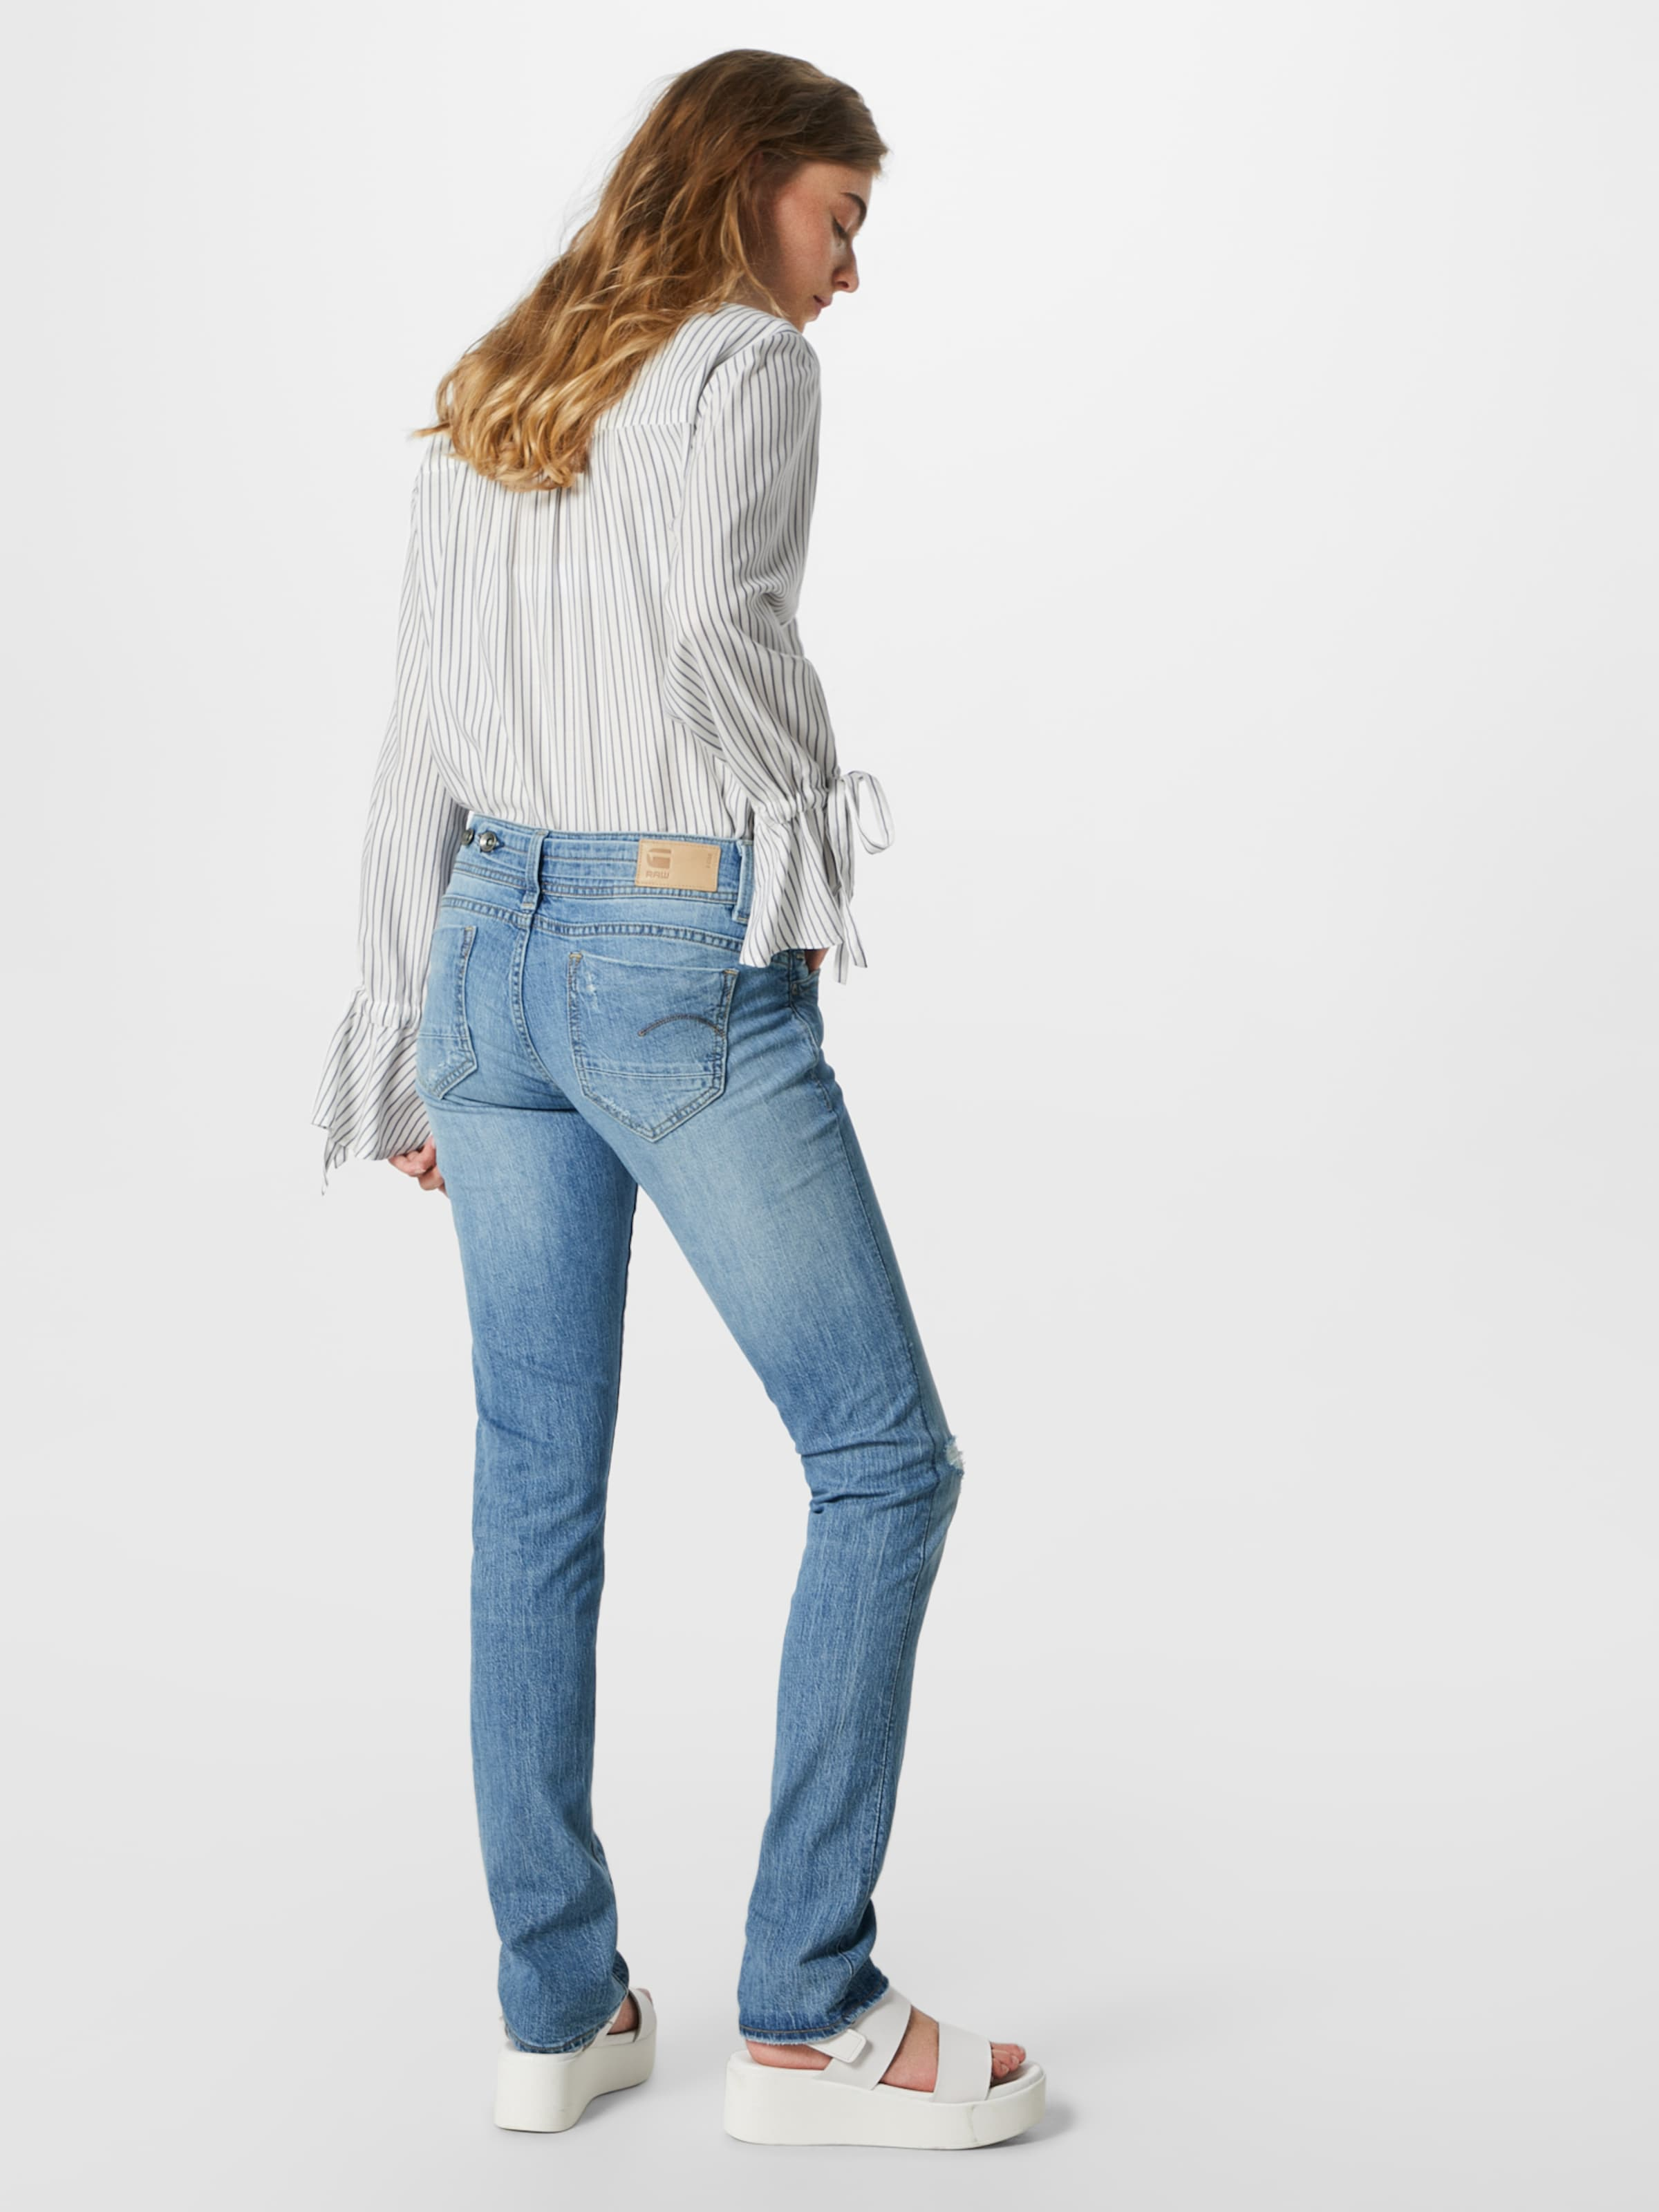 Saddle' Jean 'midge star En Bleu G Raw Denim OkiuZwPXTl